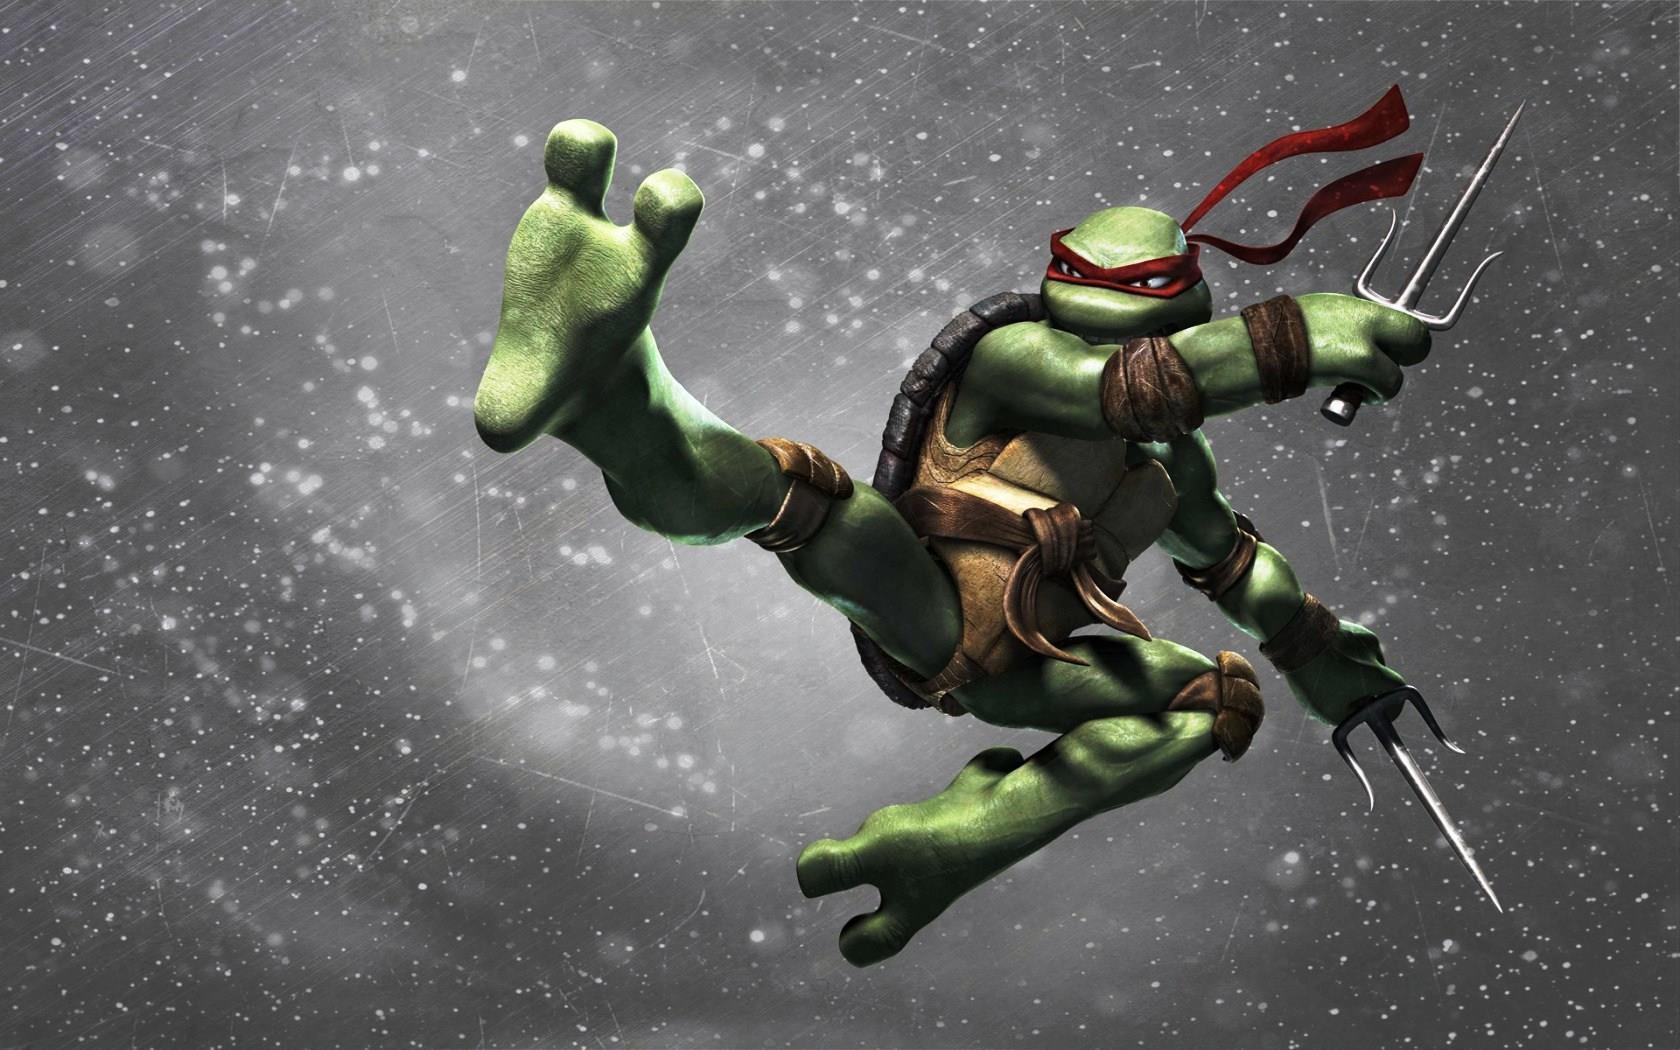 tortues-ninja-grand-format_3